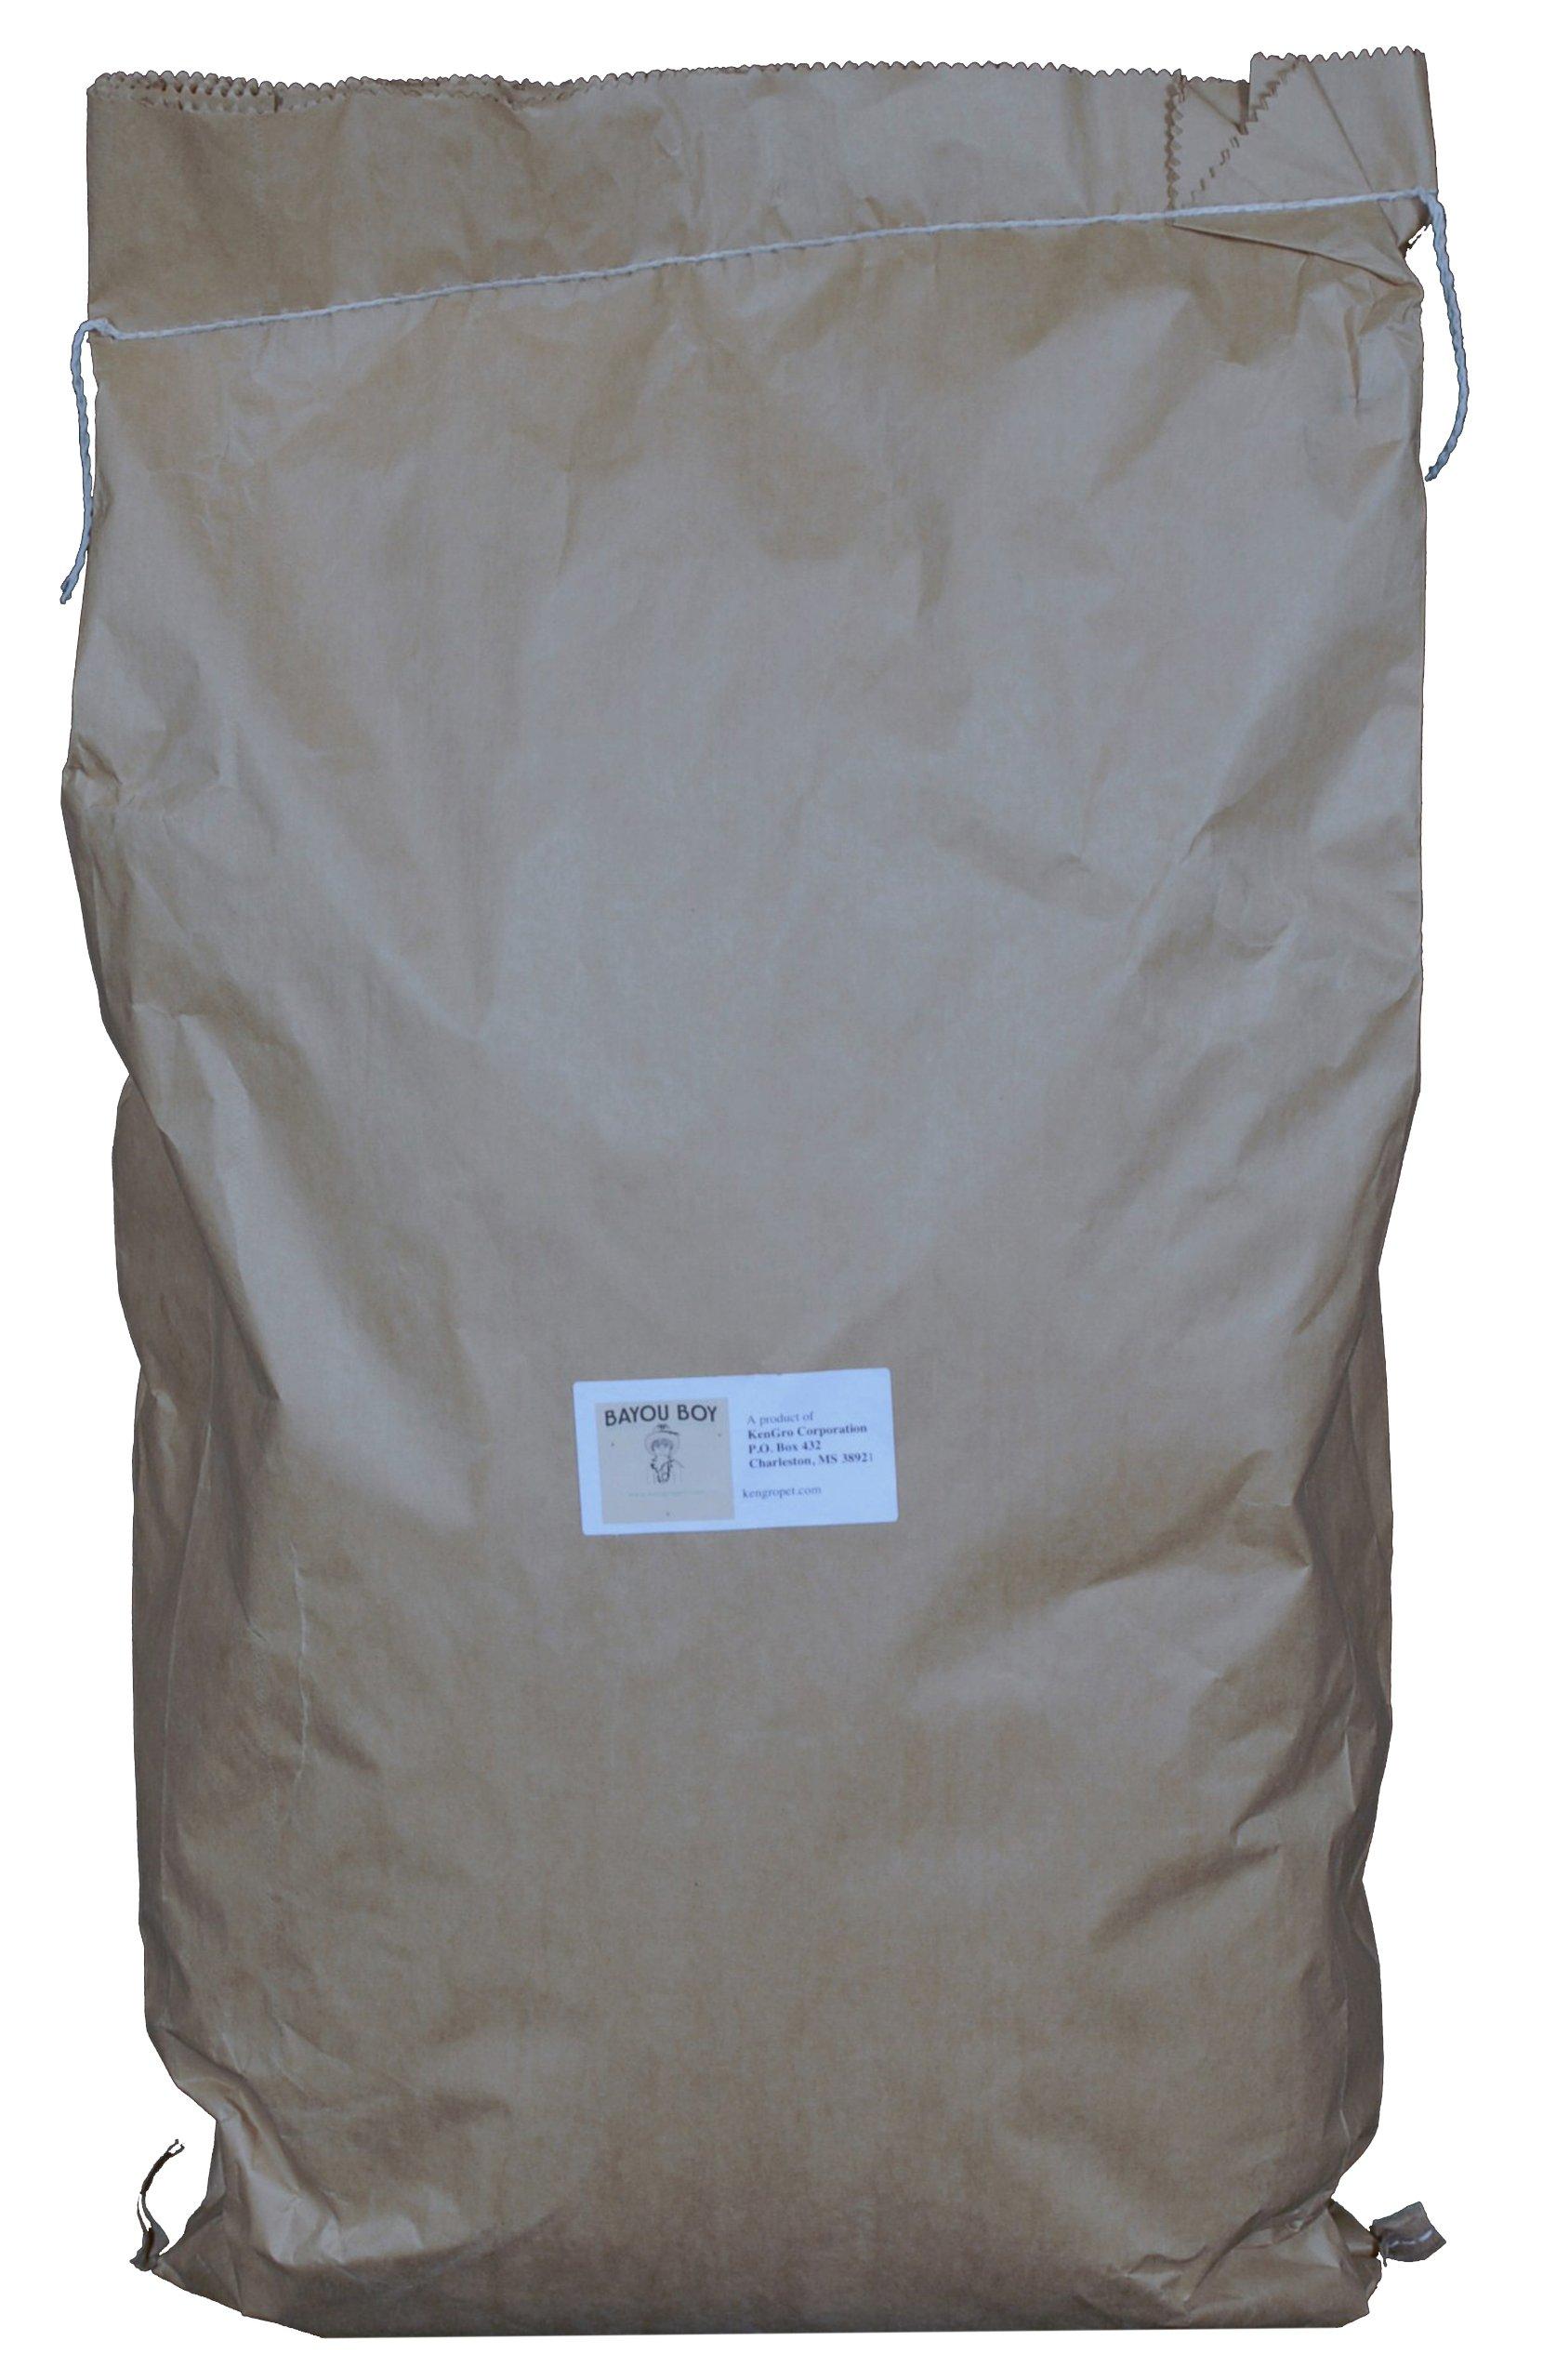 Bayou Boy All Natural Reptile Bedding Bag, 50-Quart